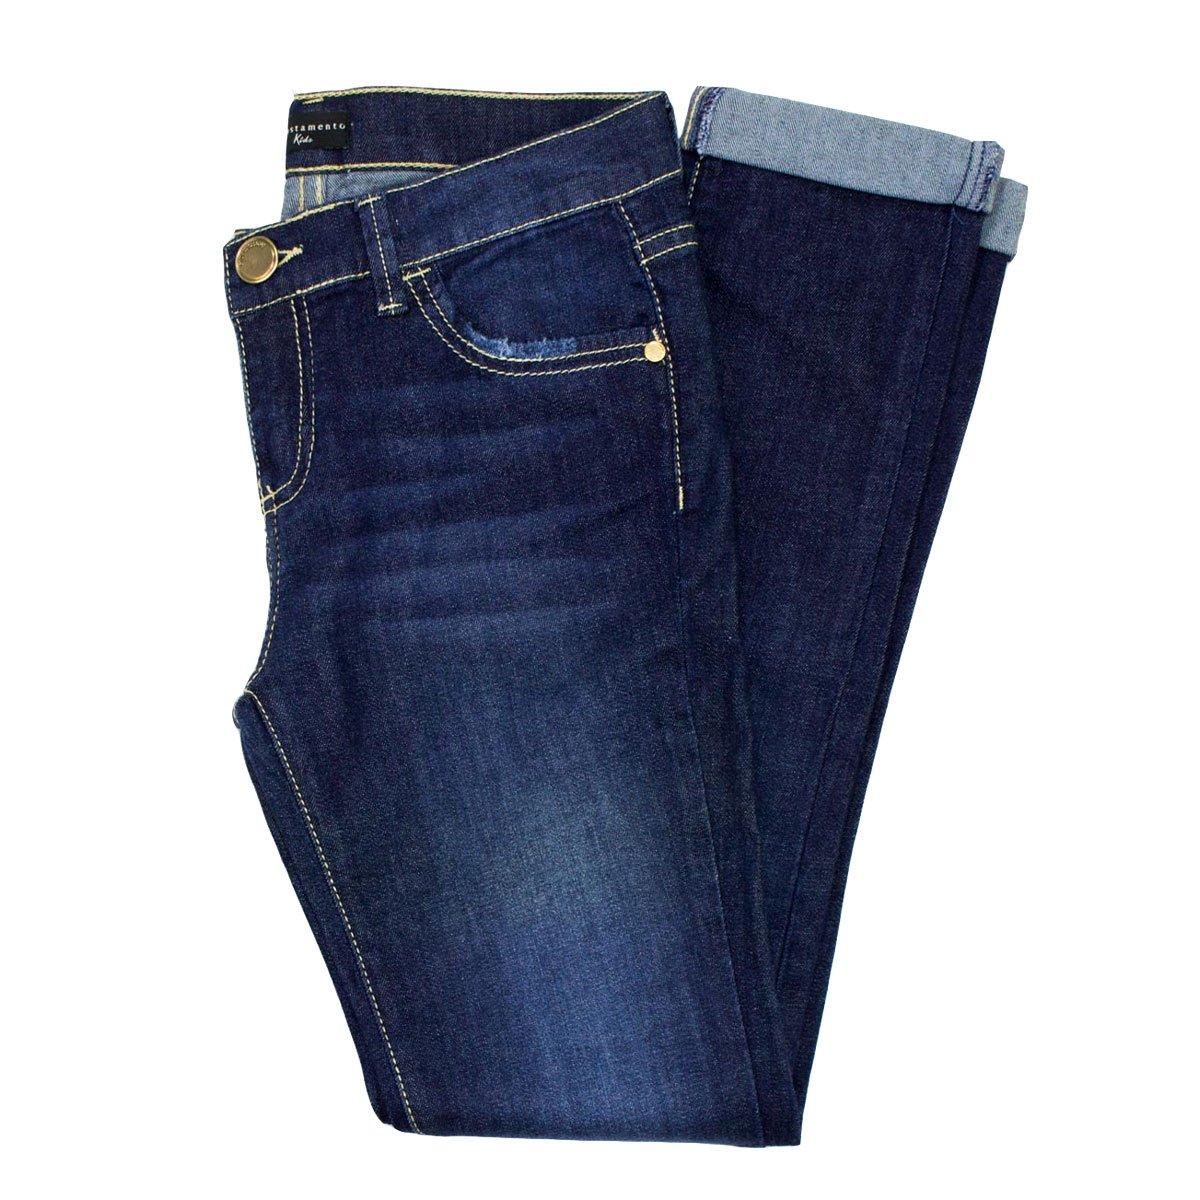 Bizz Store - Calça Jeans Infantil Feminina Acostamento Kids 08bffd9b37f4e